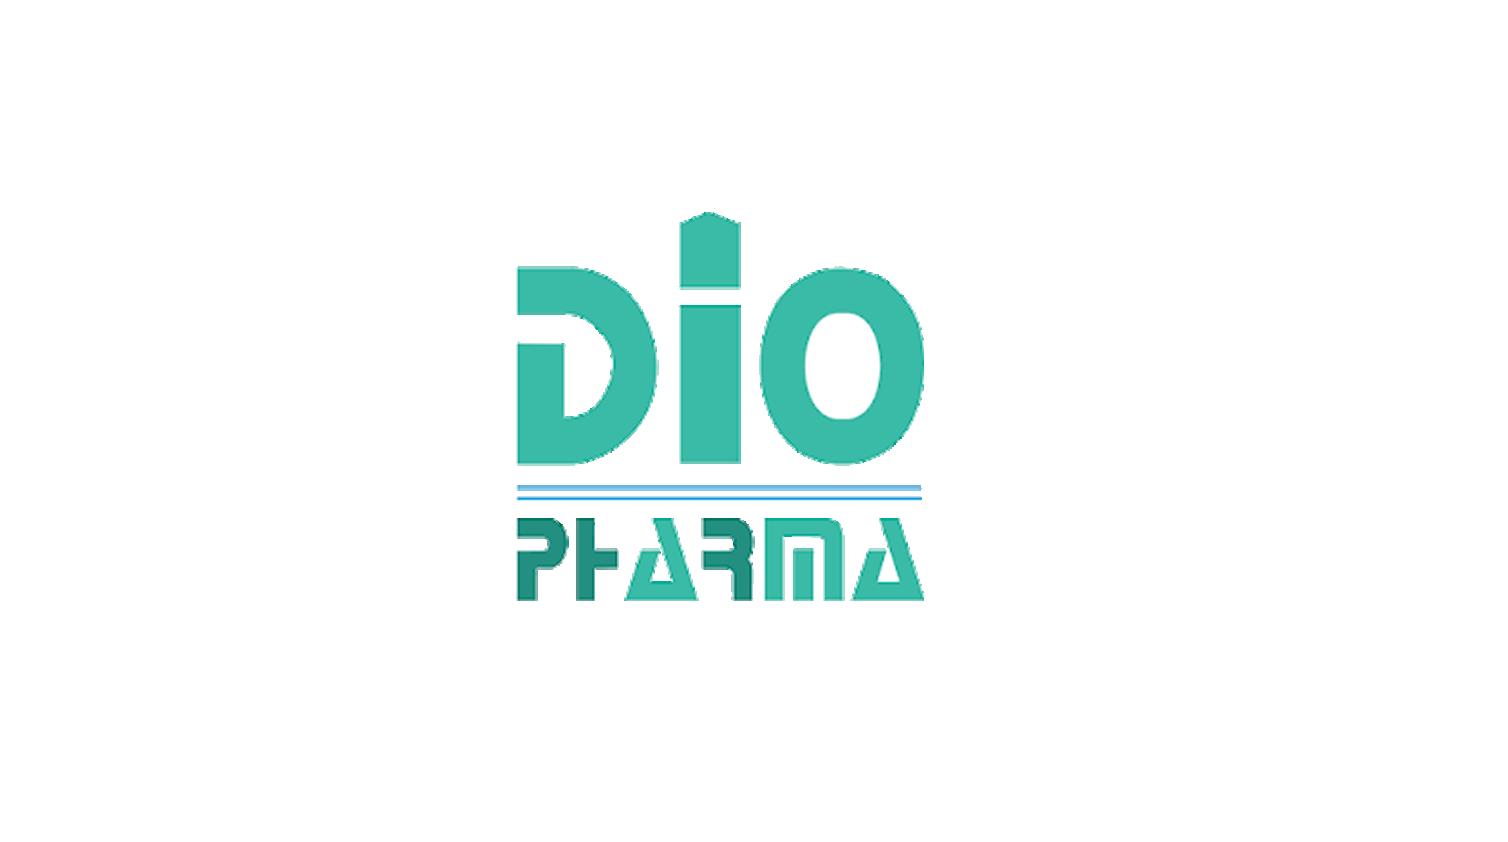 dio pharma